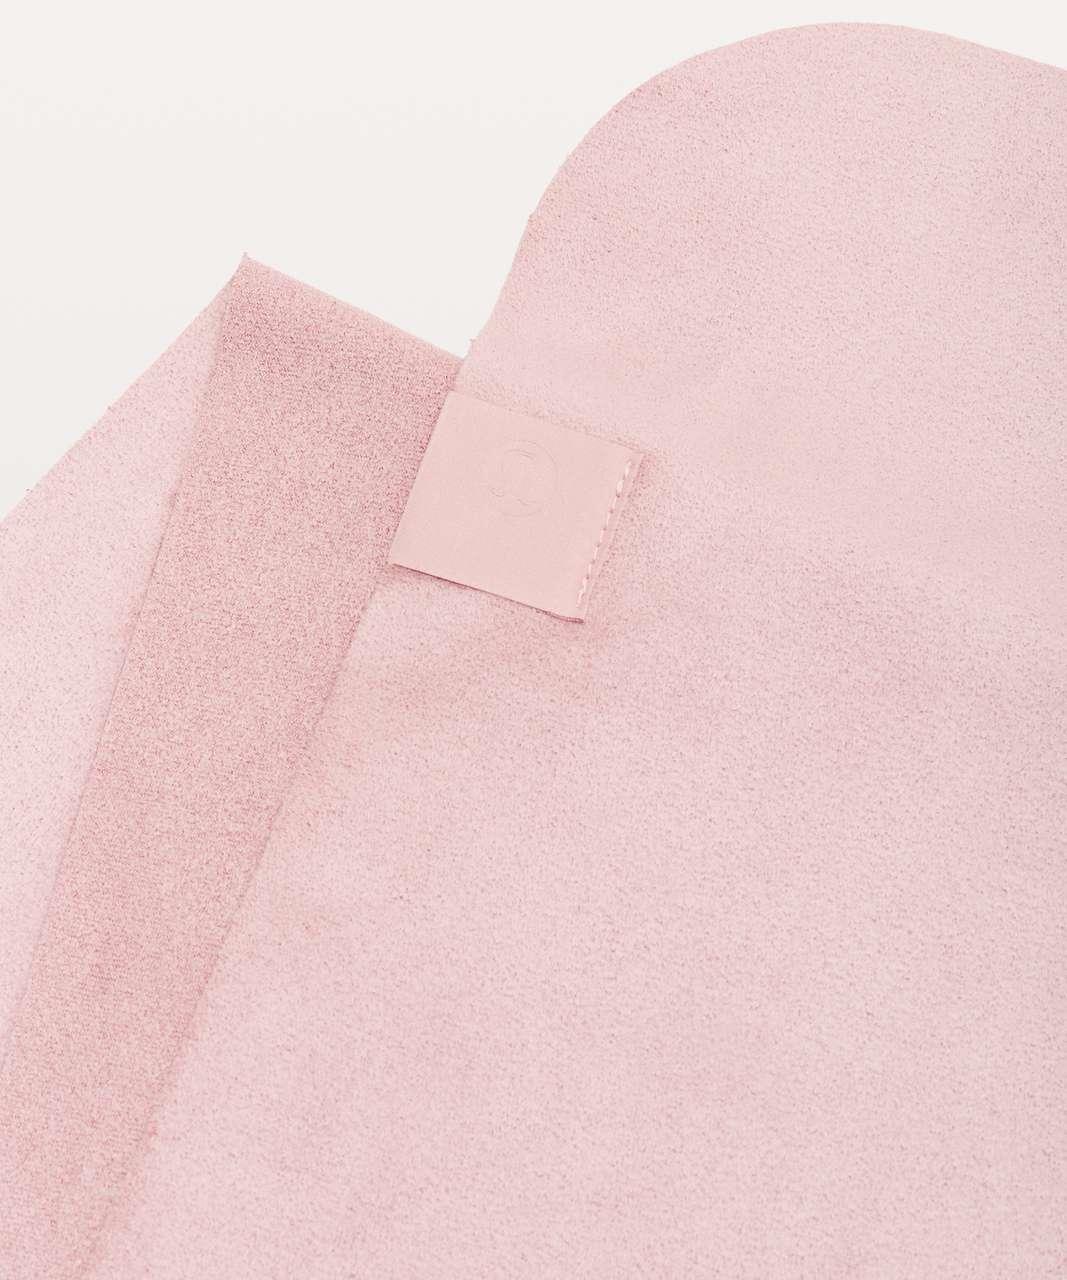 Lululemon The Towel - Misty Rose